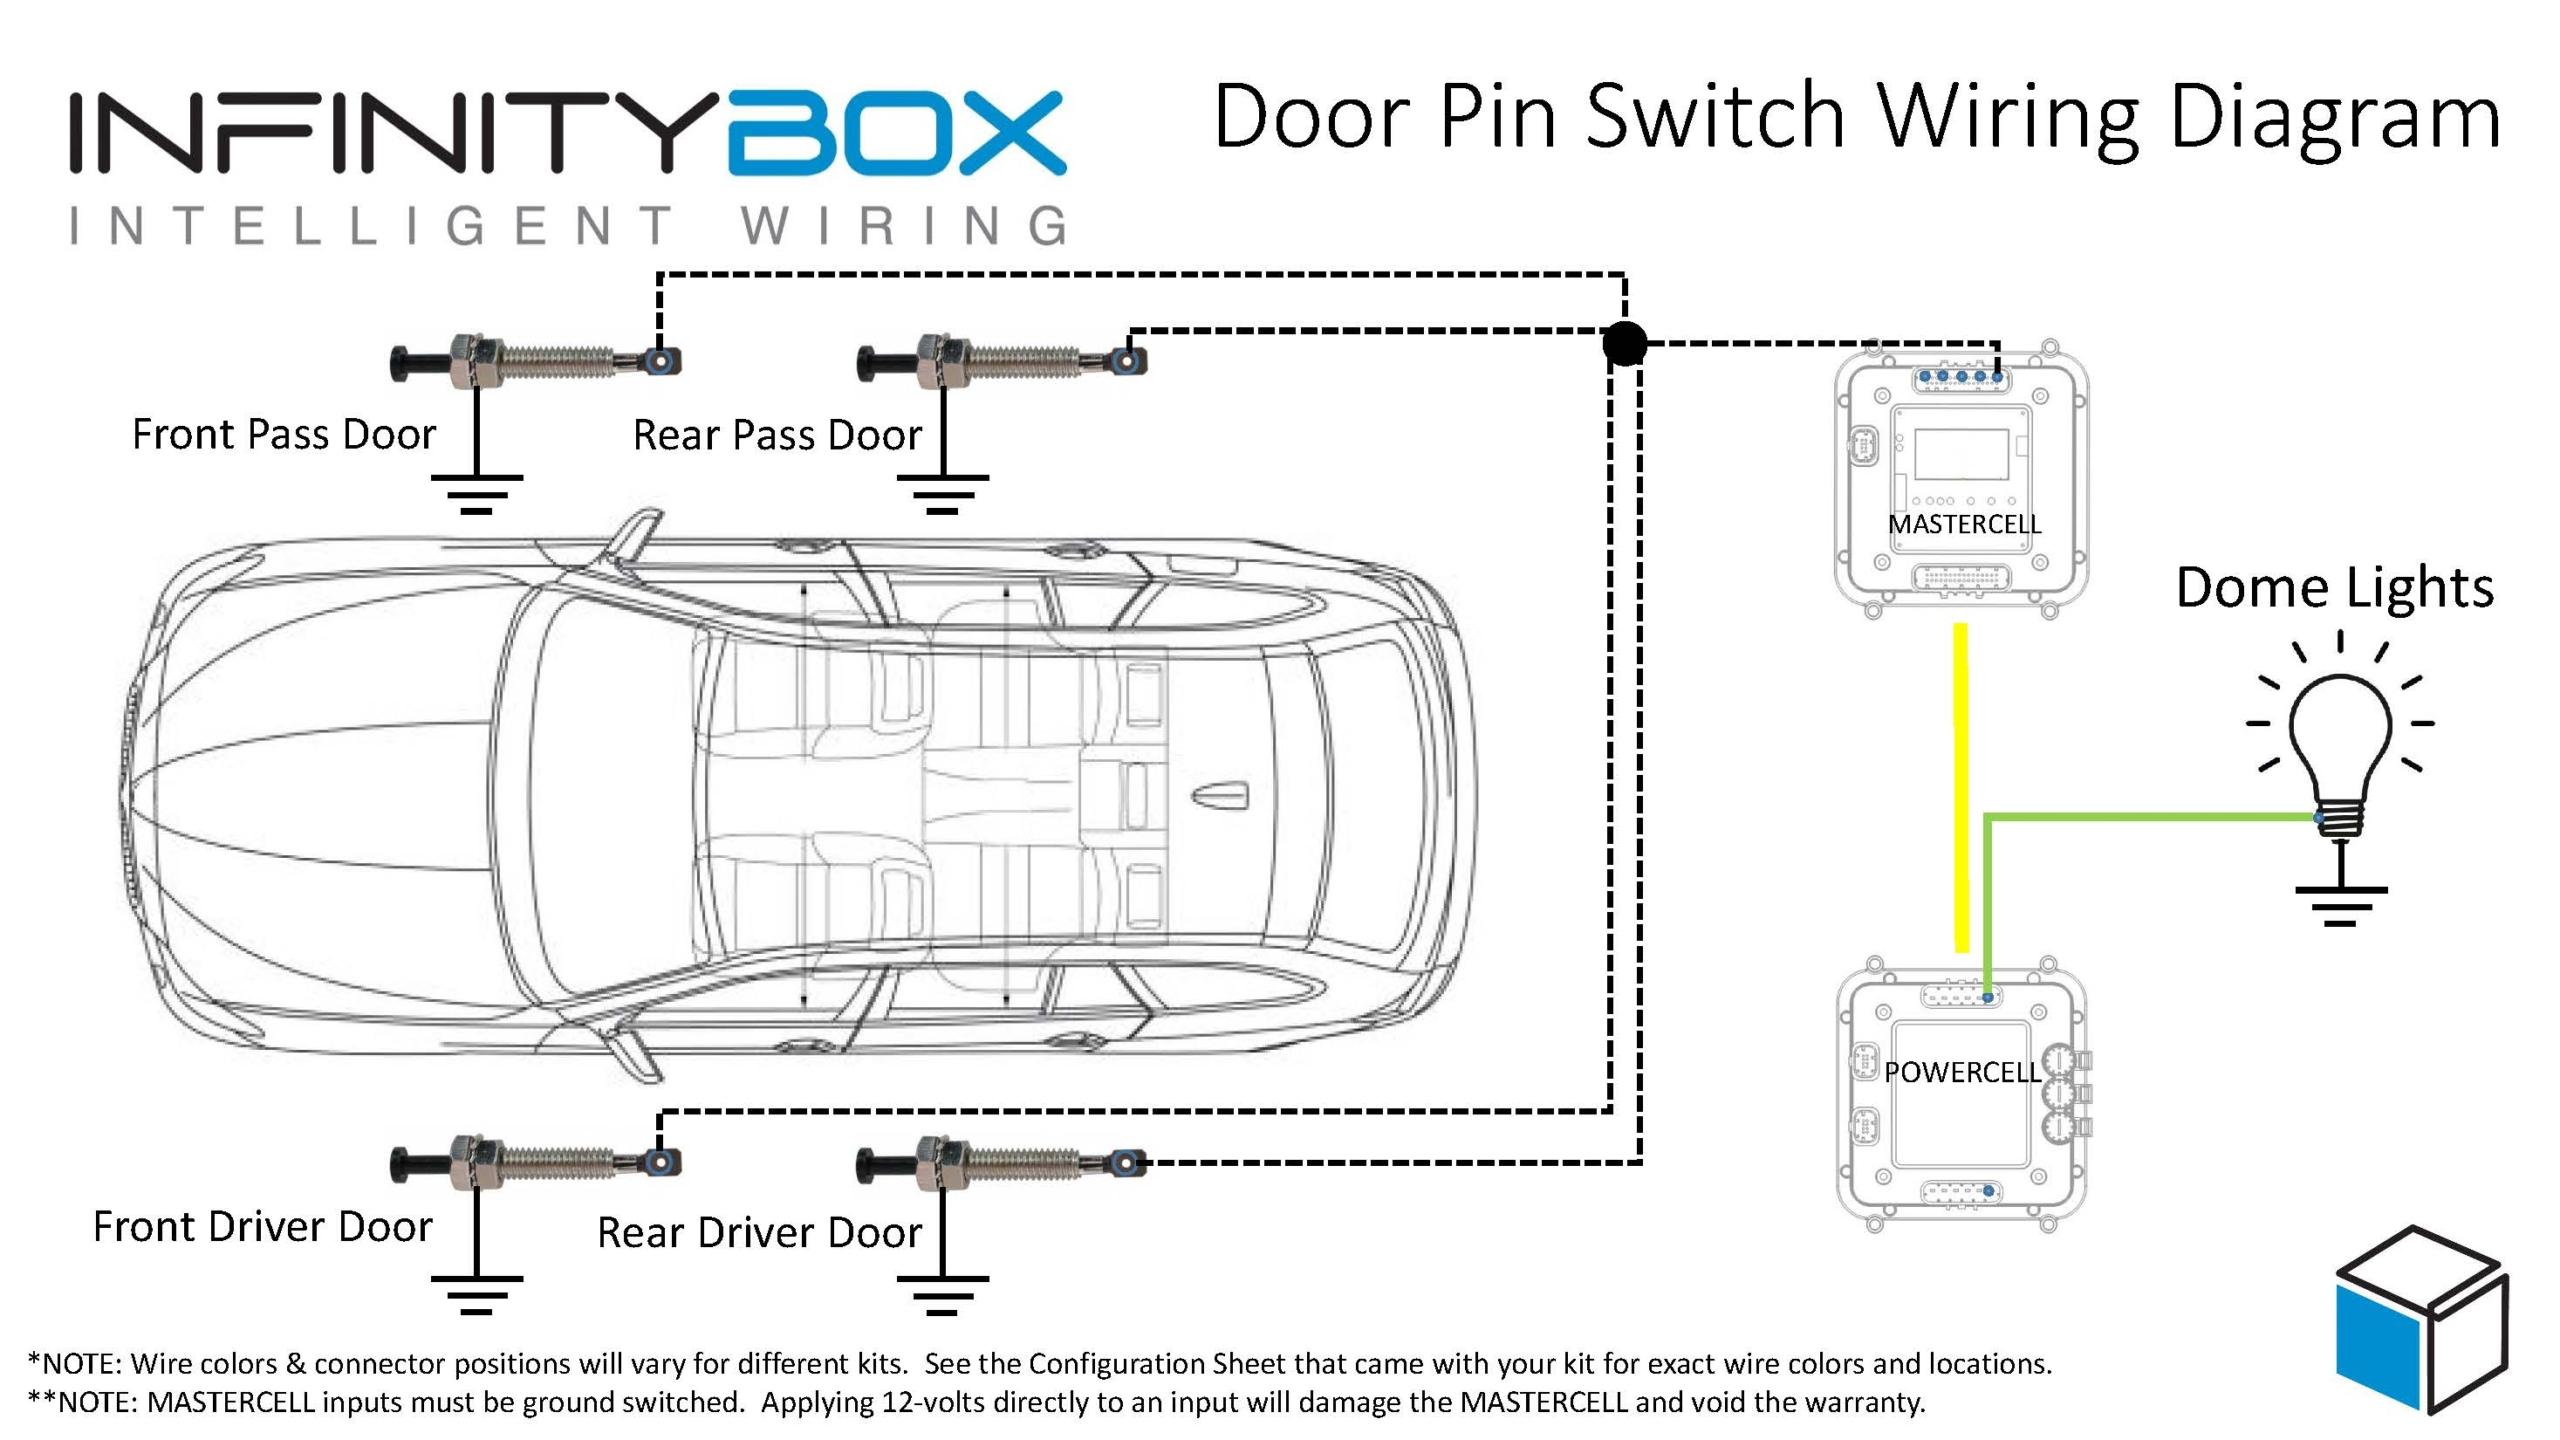 Wiring Door Pin Switches - InfinityboxInfinitybox